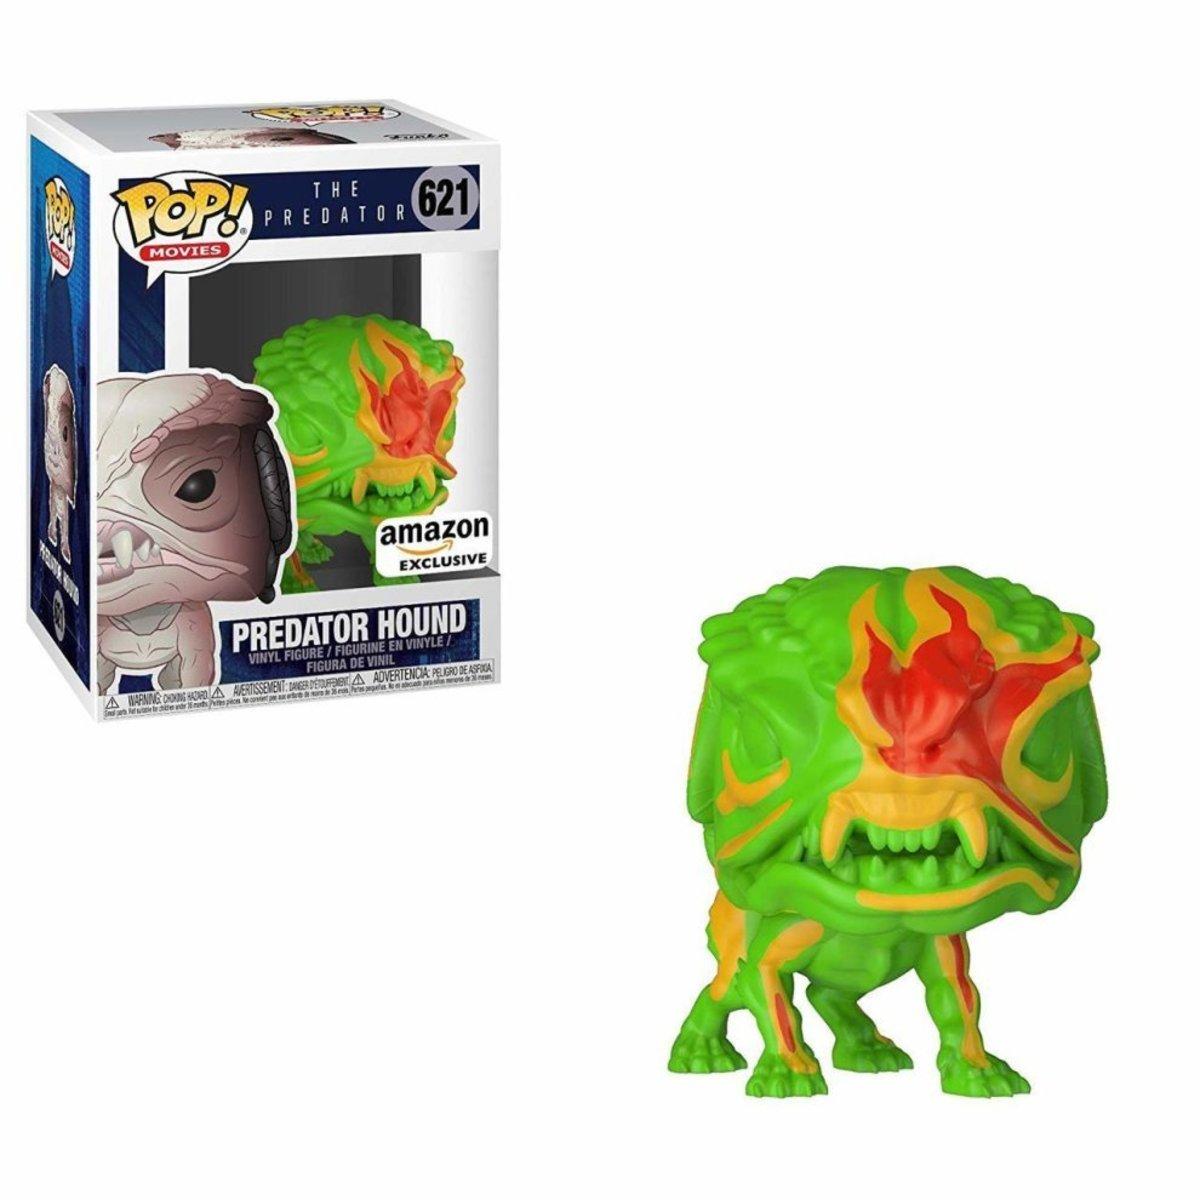 IE POP 鐵血戰士:血獸進化 - Predator Dog